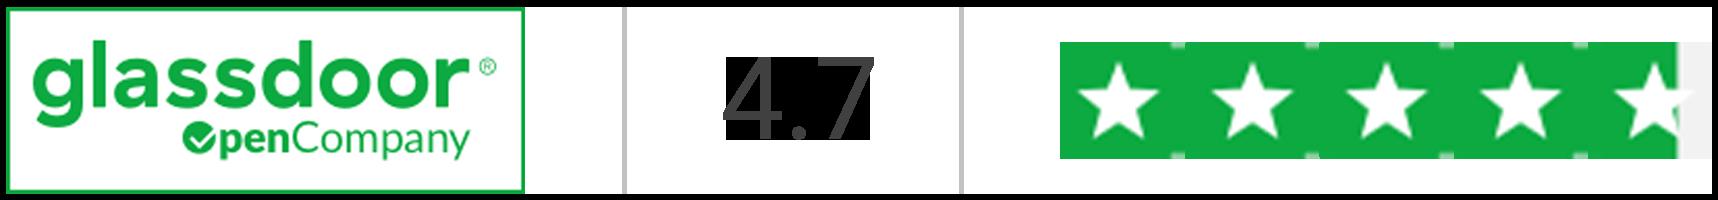 Glassdoor OpenCompany Badge